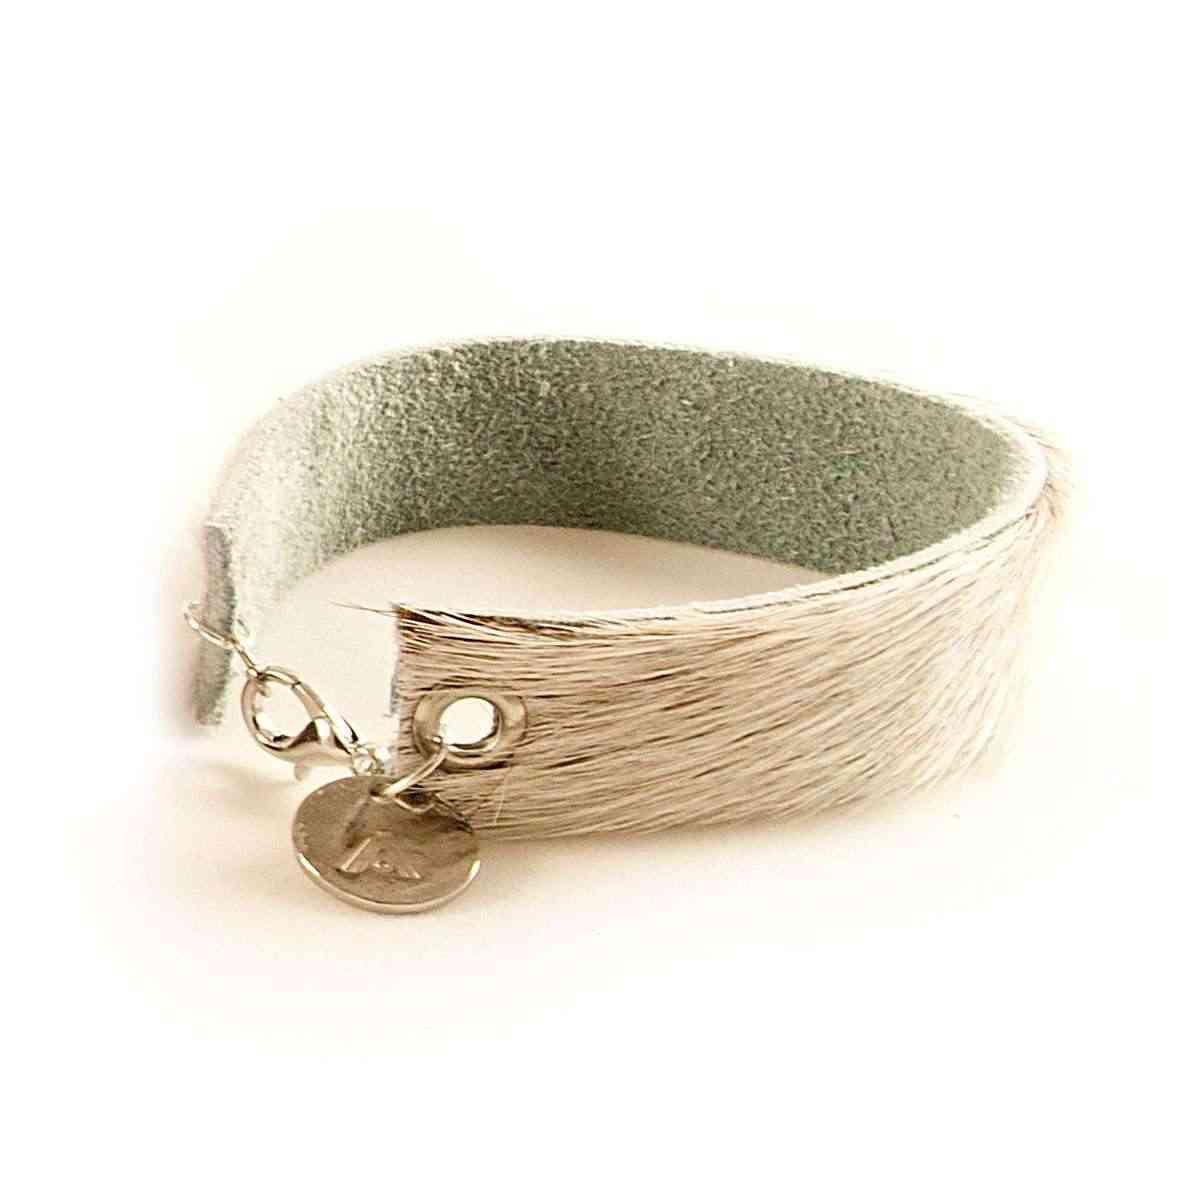 Wrips - Cow Print - Single Wrap Bracelet White